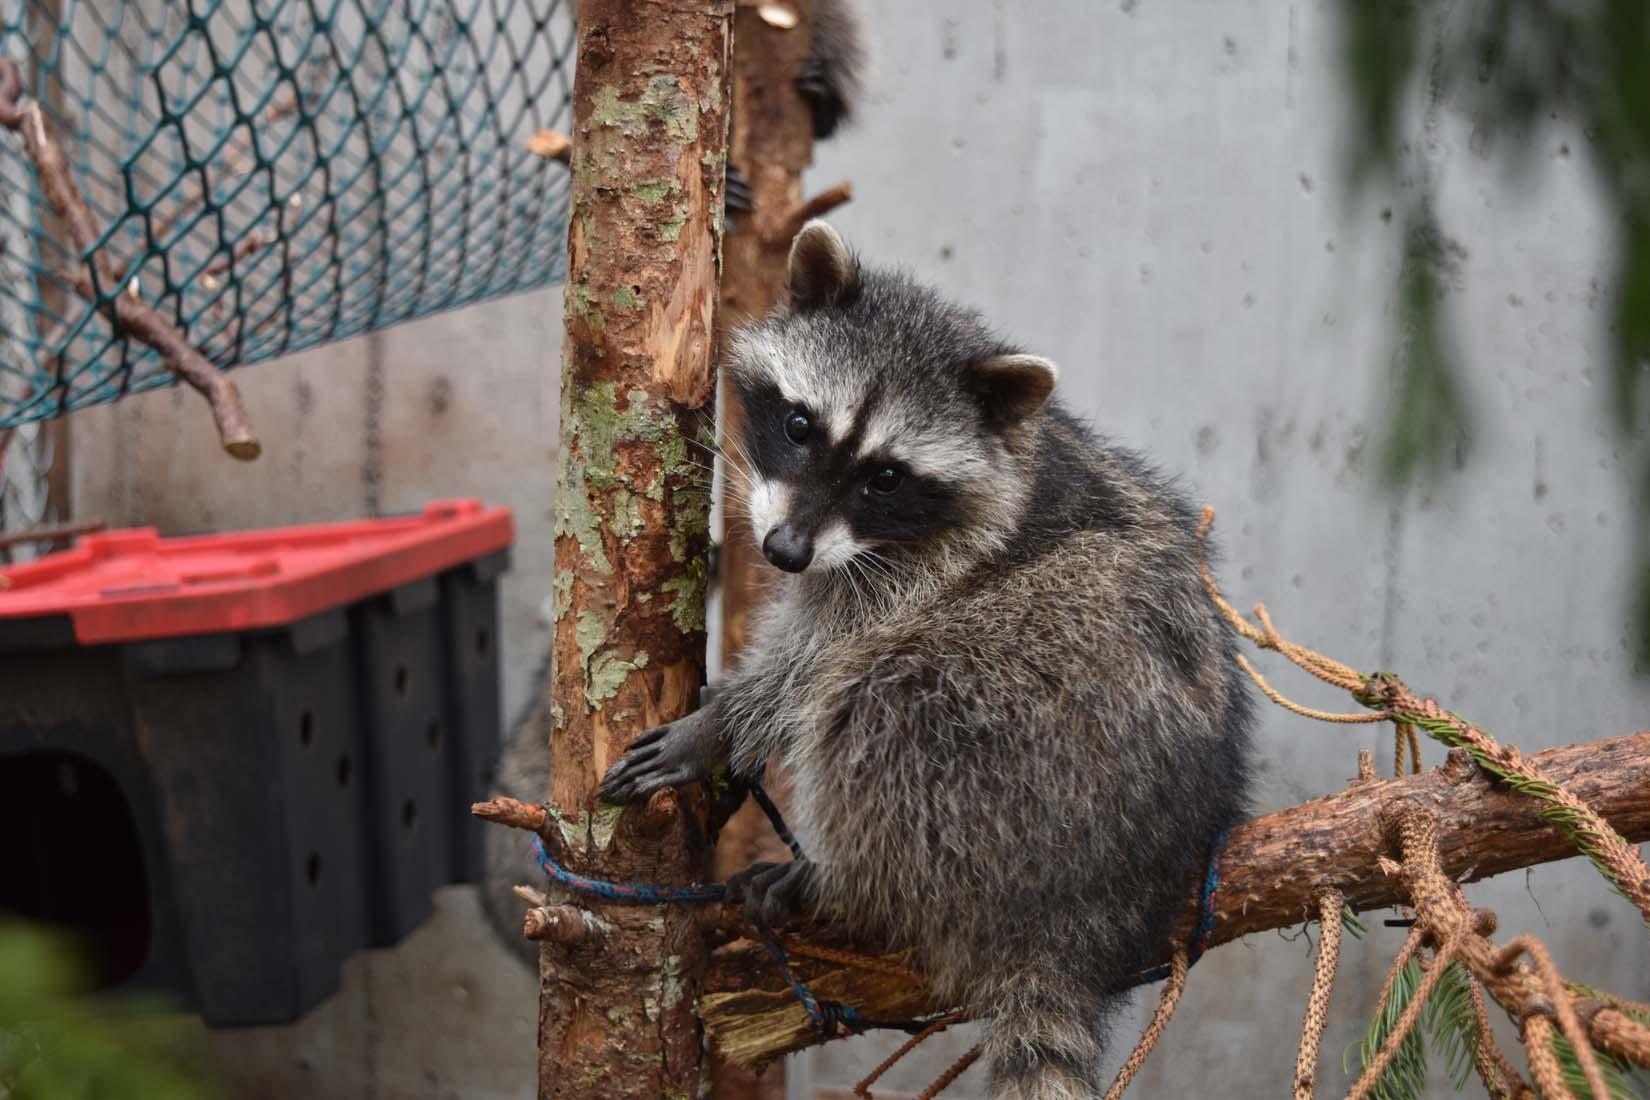 BC SPCA Wild ARC CritterCam - Watch wildlife in care live